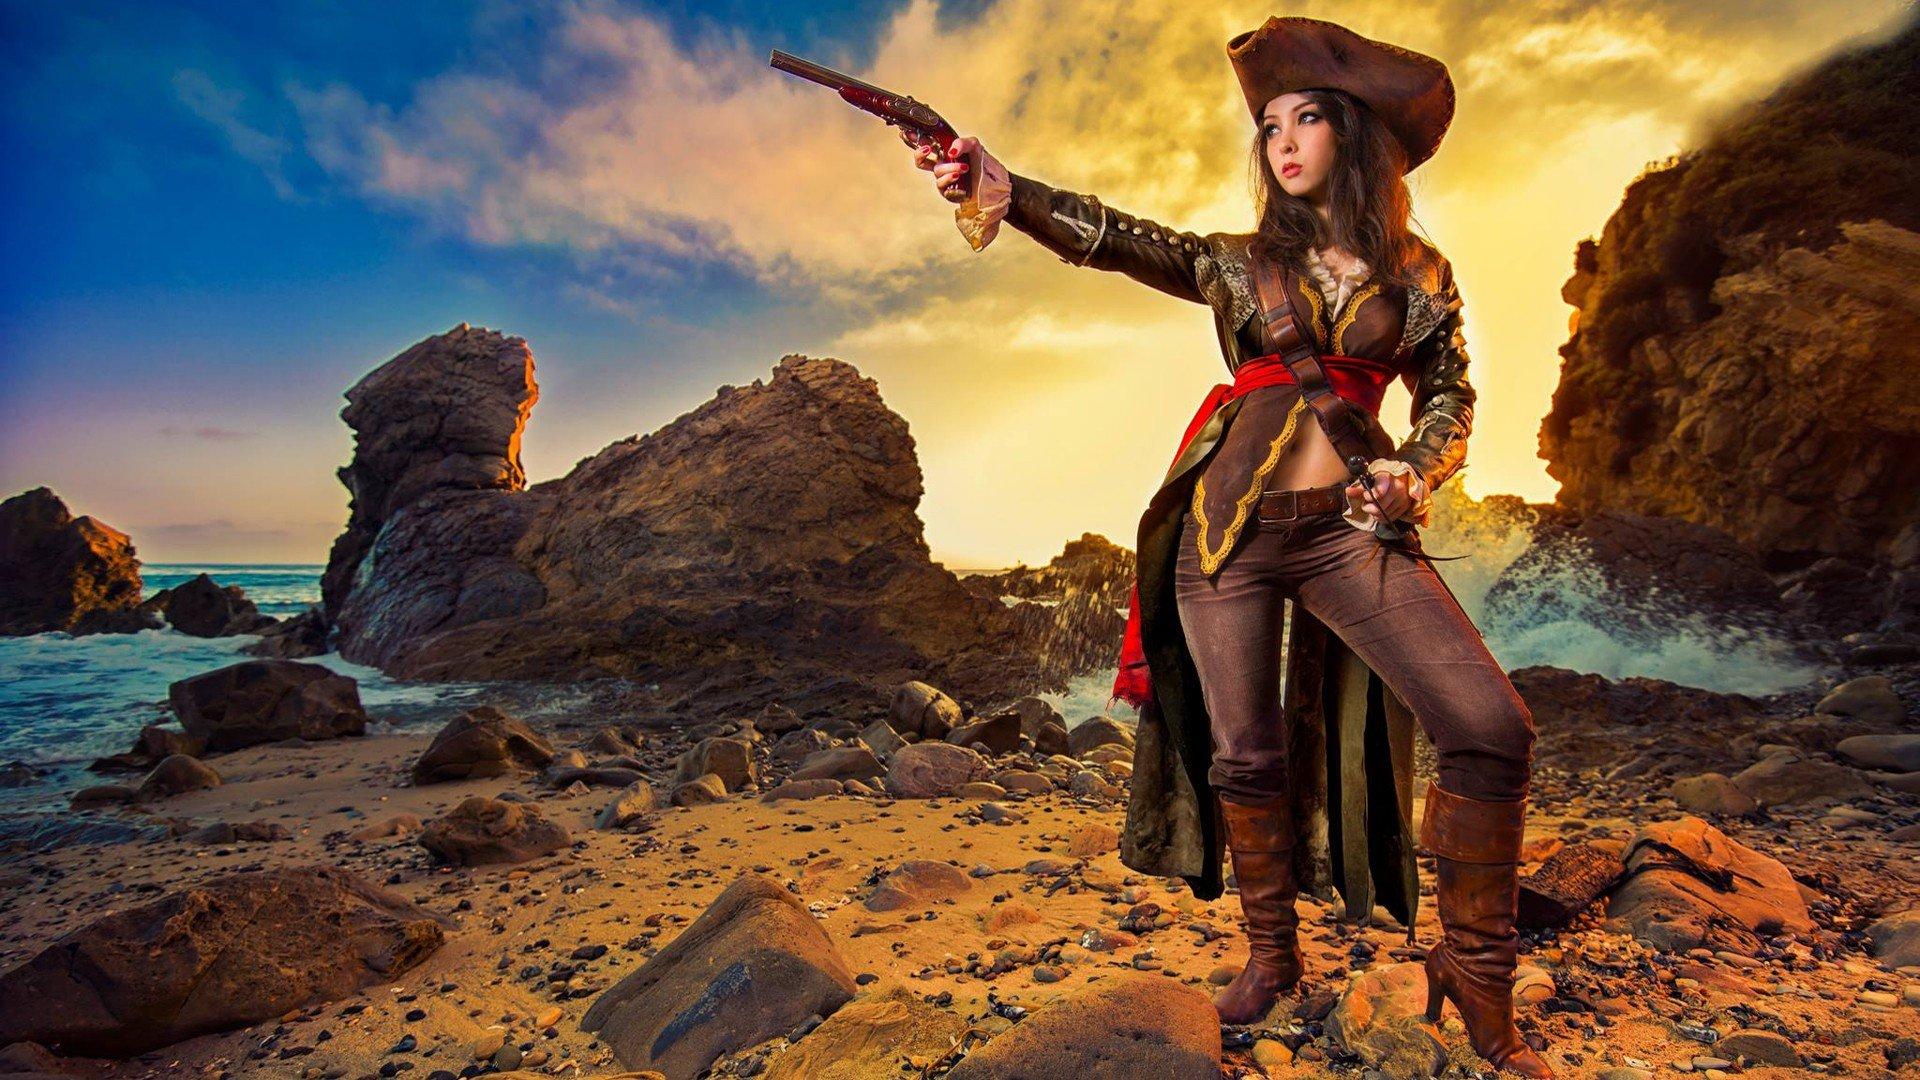 Monika Lee Assassins Creed Cosplay Hd Wallpapers Desktop And